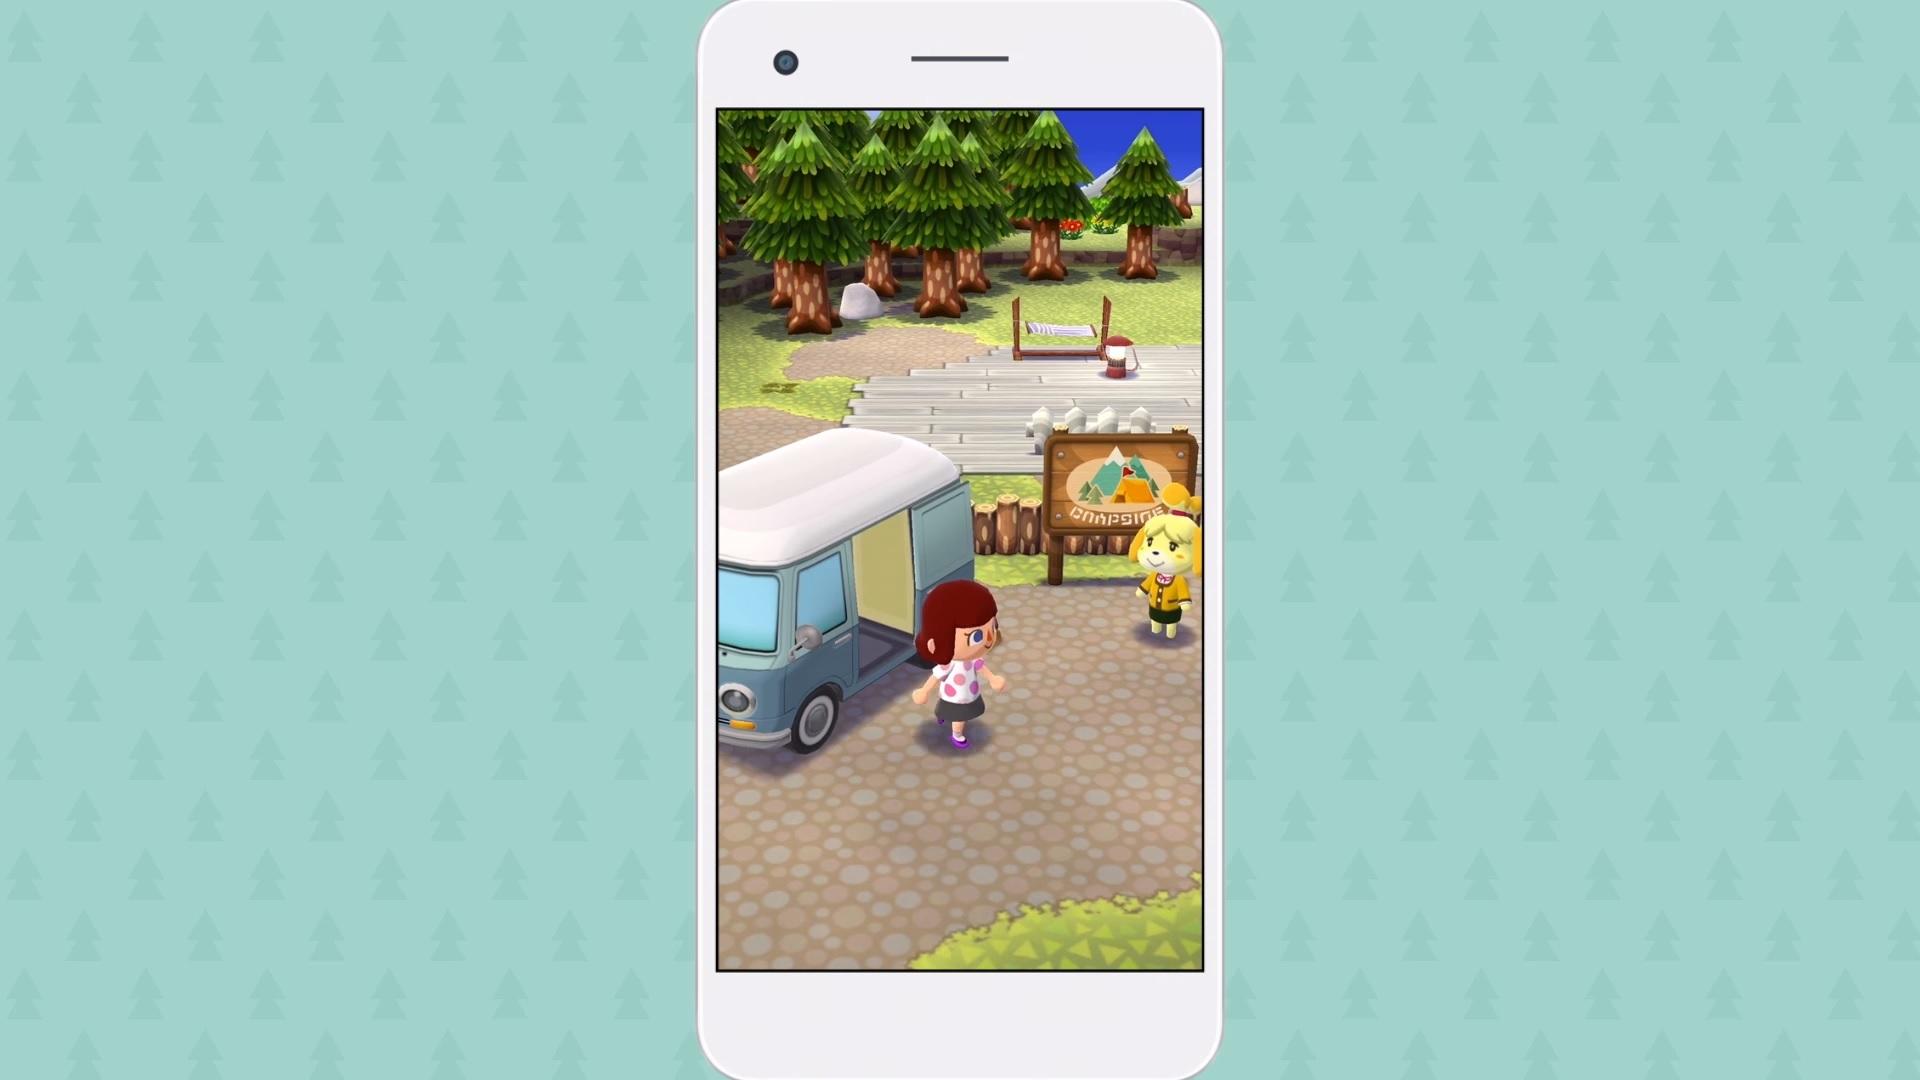 animal-crossing-pocket-camp-brings-the-popular-franchise-to-mobile-social.jpg